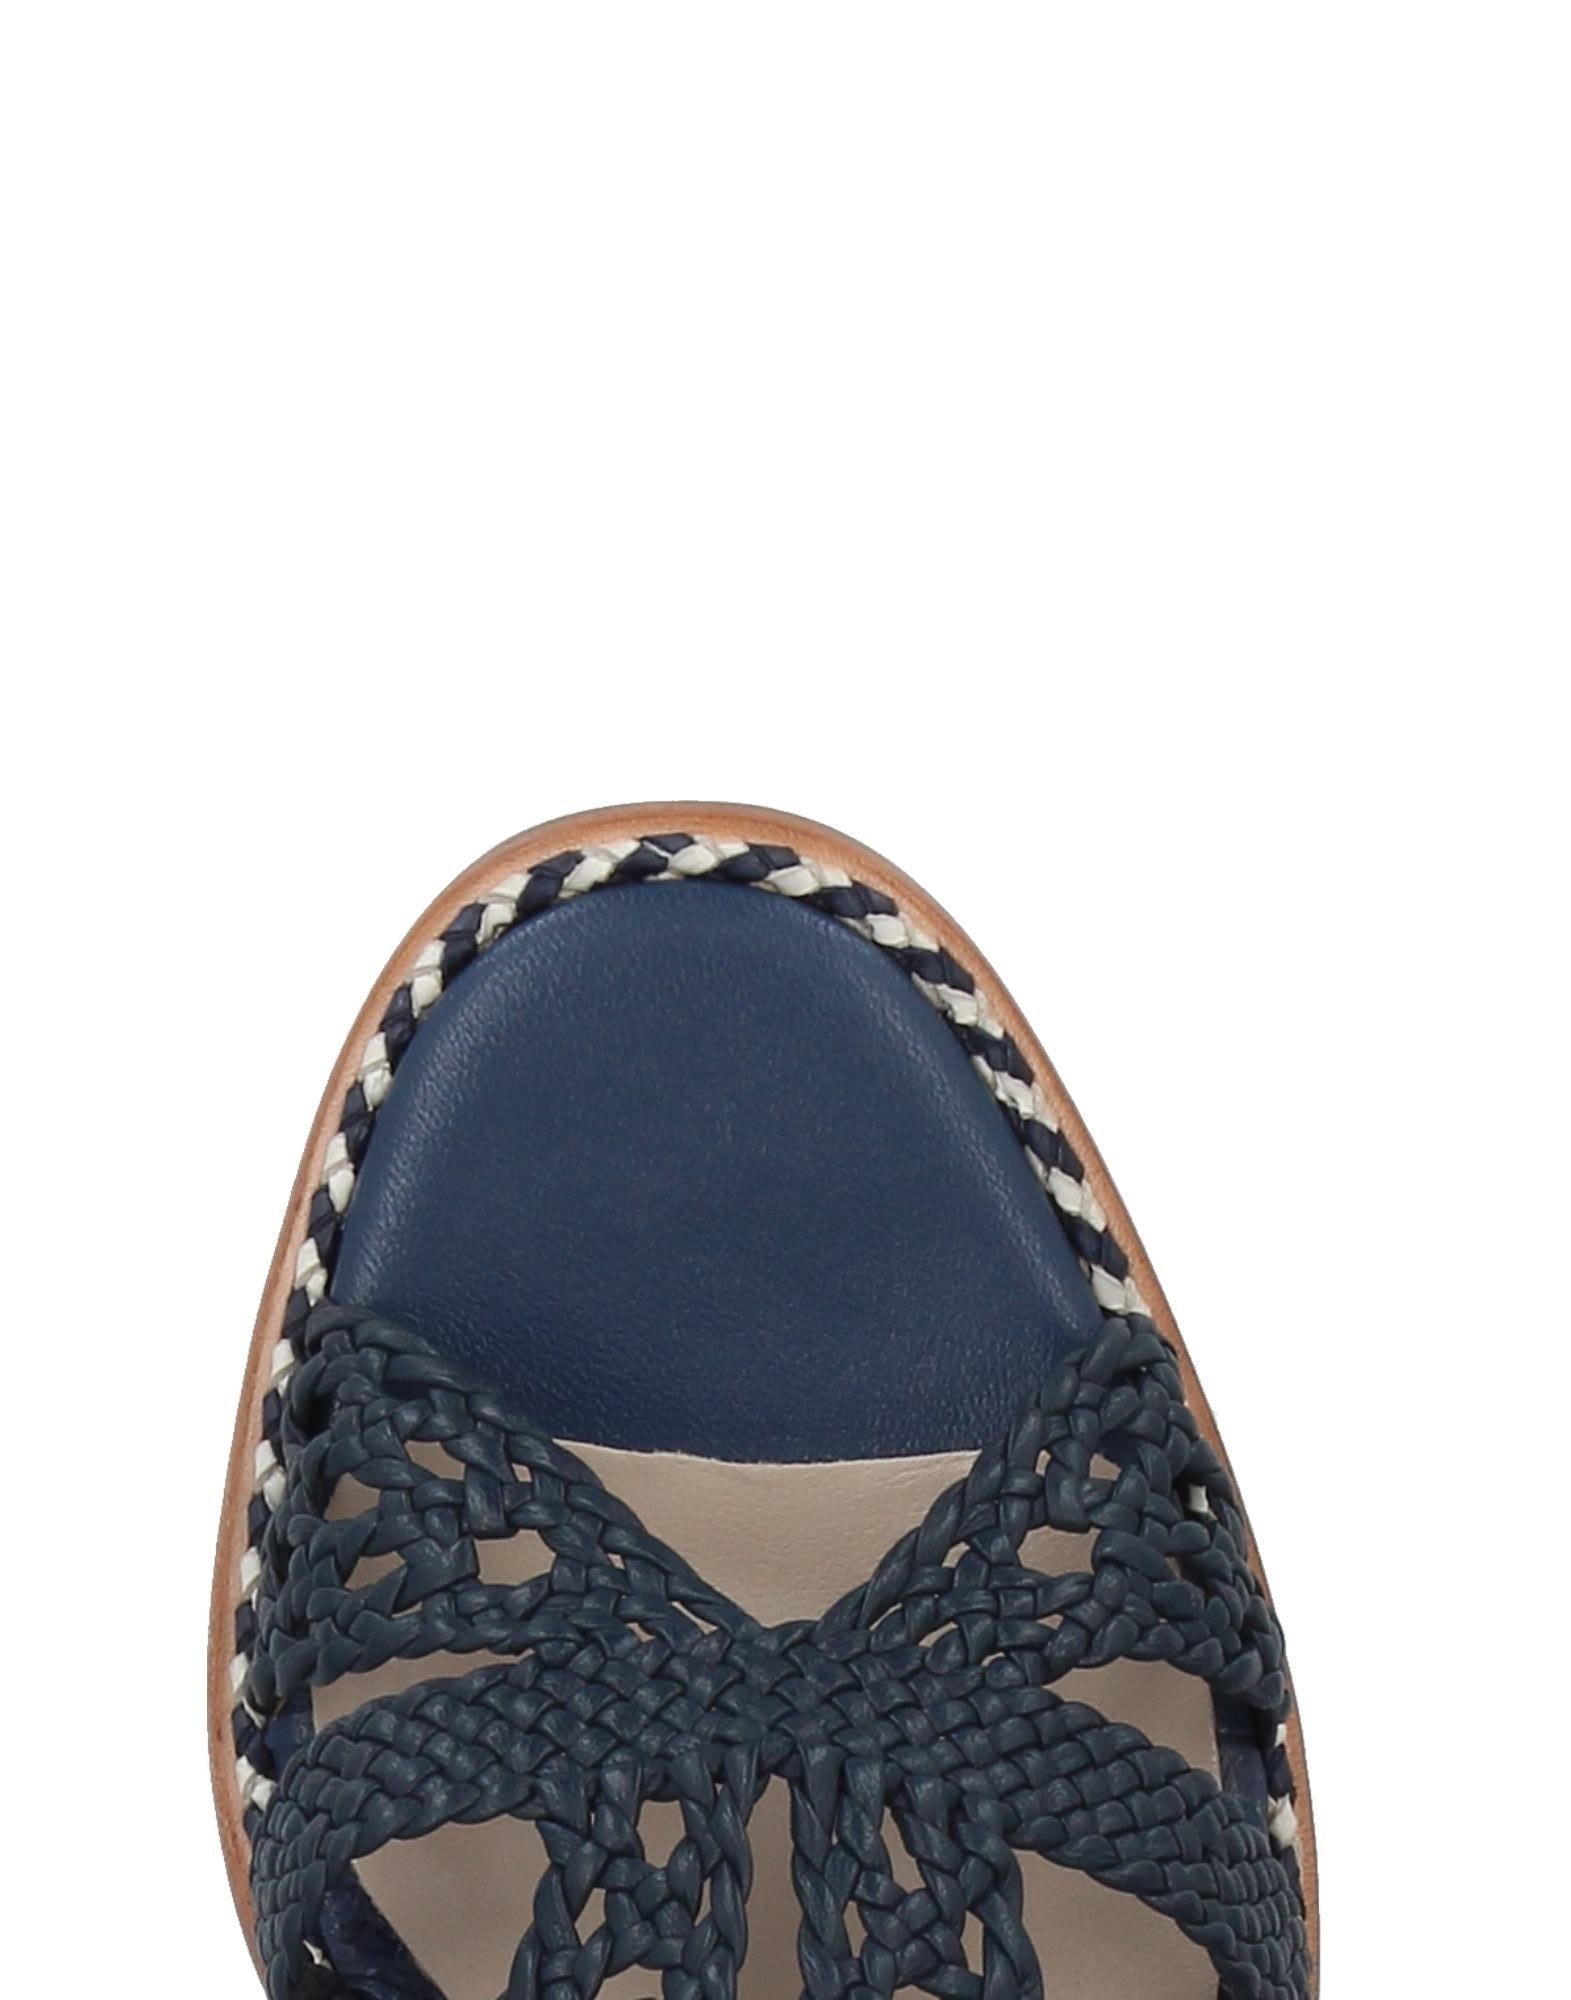 Paloma Paloma Paloma Barceló Sandalen Damen  11383864BA Gute Qualität beliebte Schuhe 1324e0